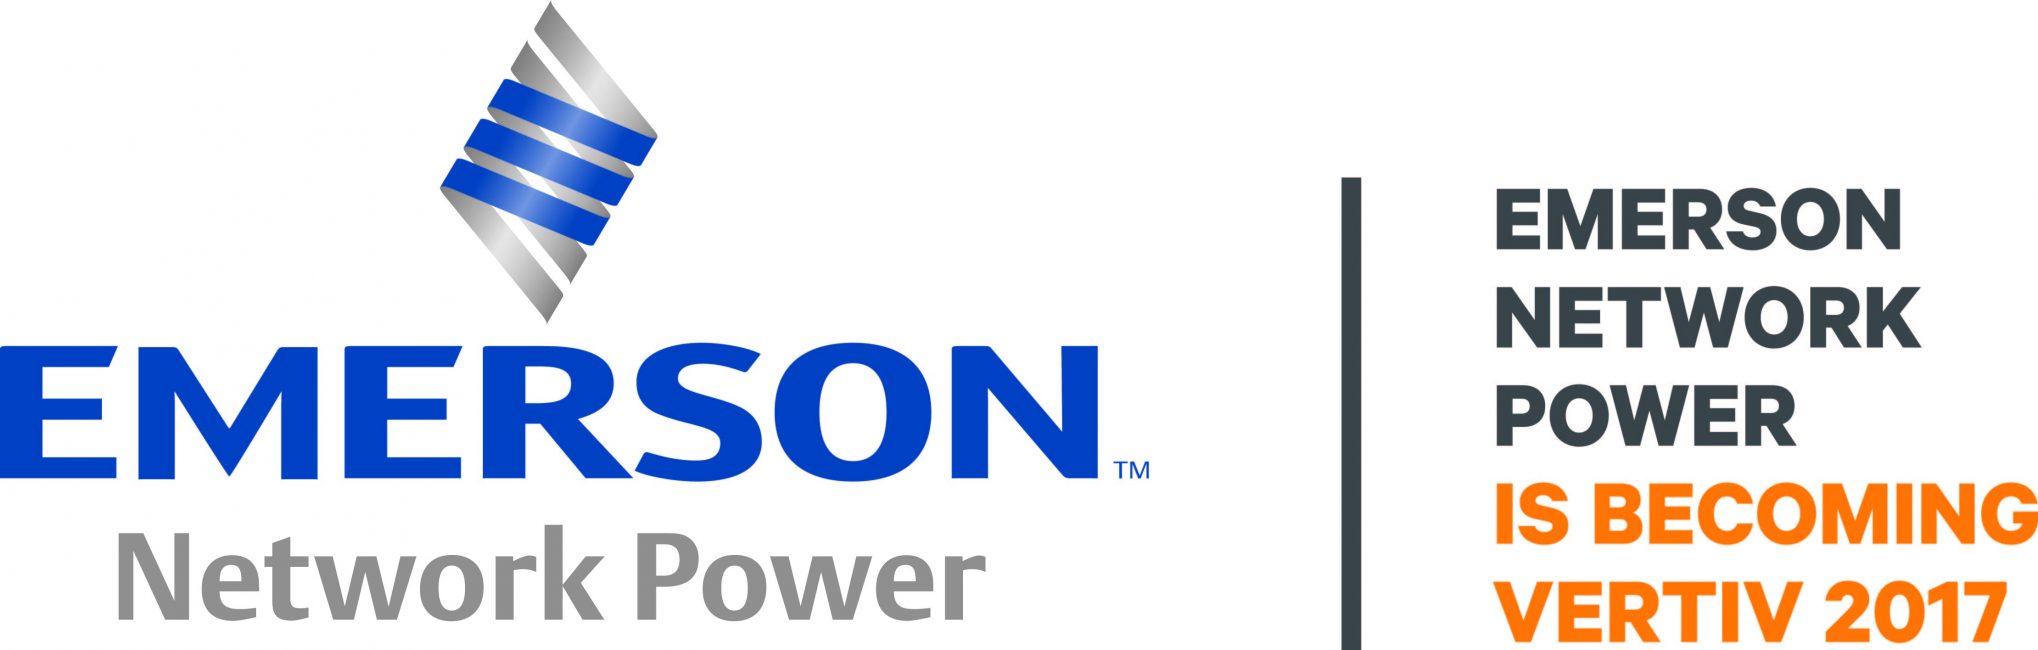 emerson-network-power-becoming-vertiv2